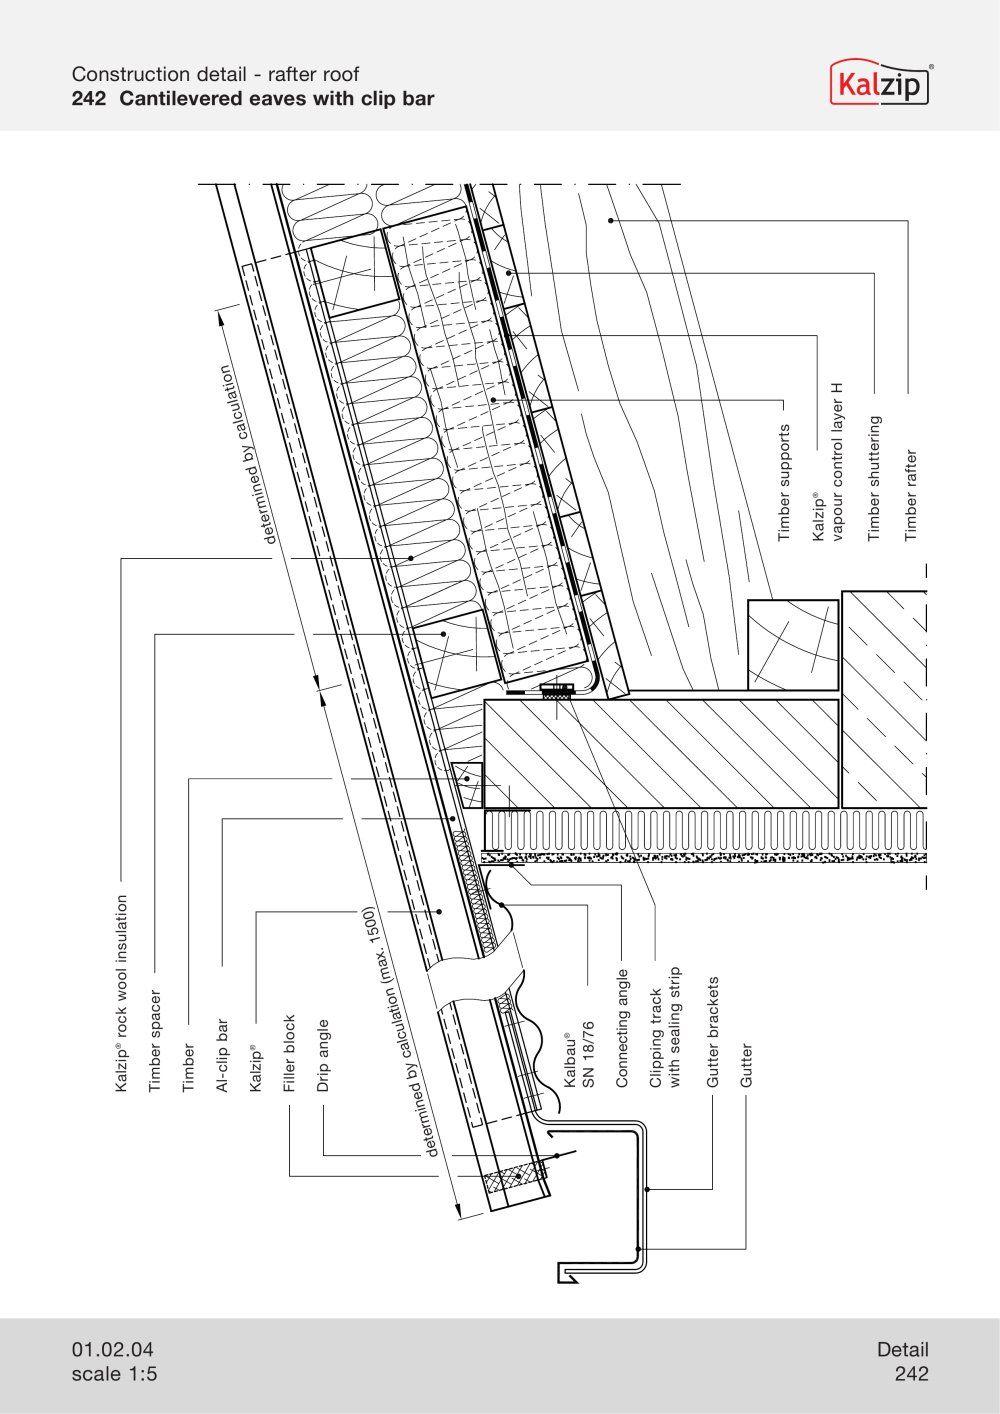 Kalzip Construction Details Sketchup Architecture